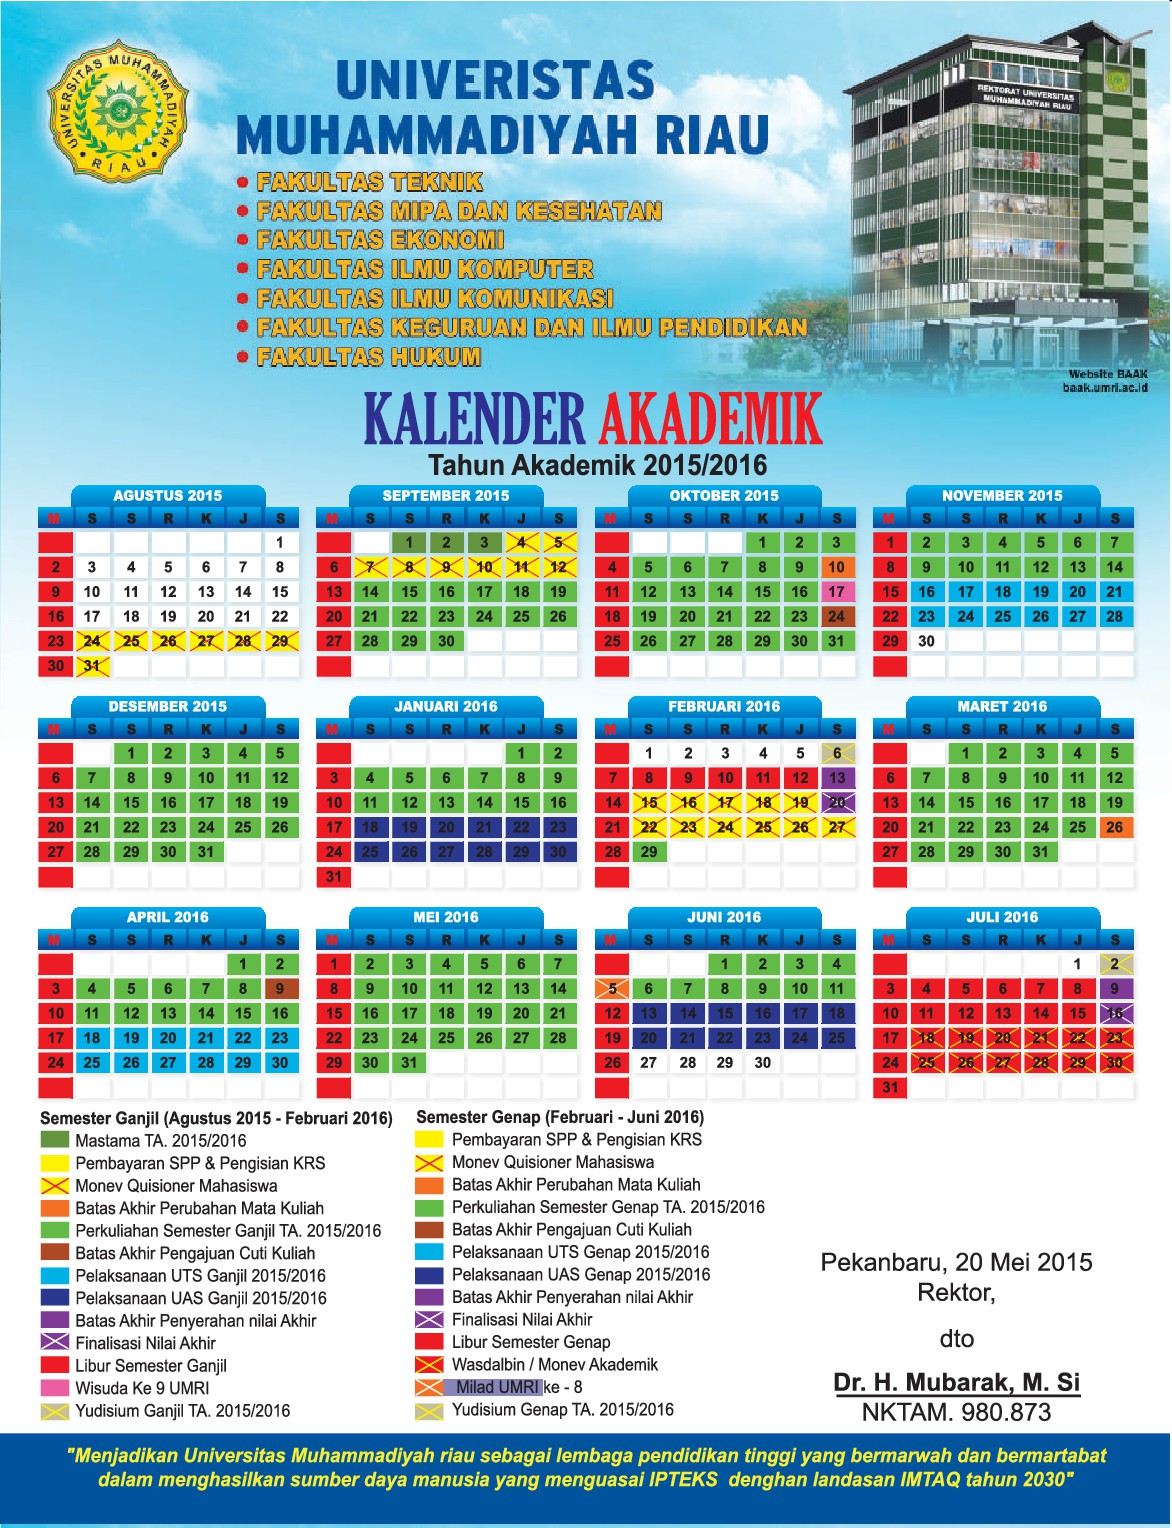 Kalender Akademik 2015-2016